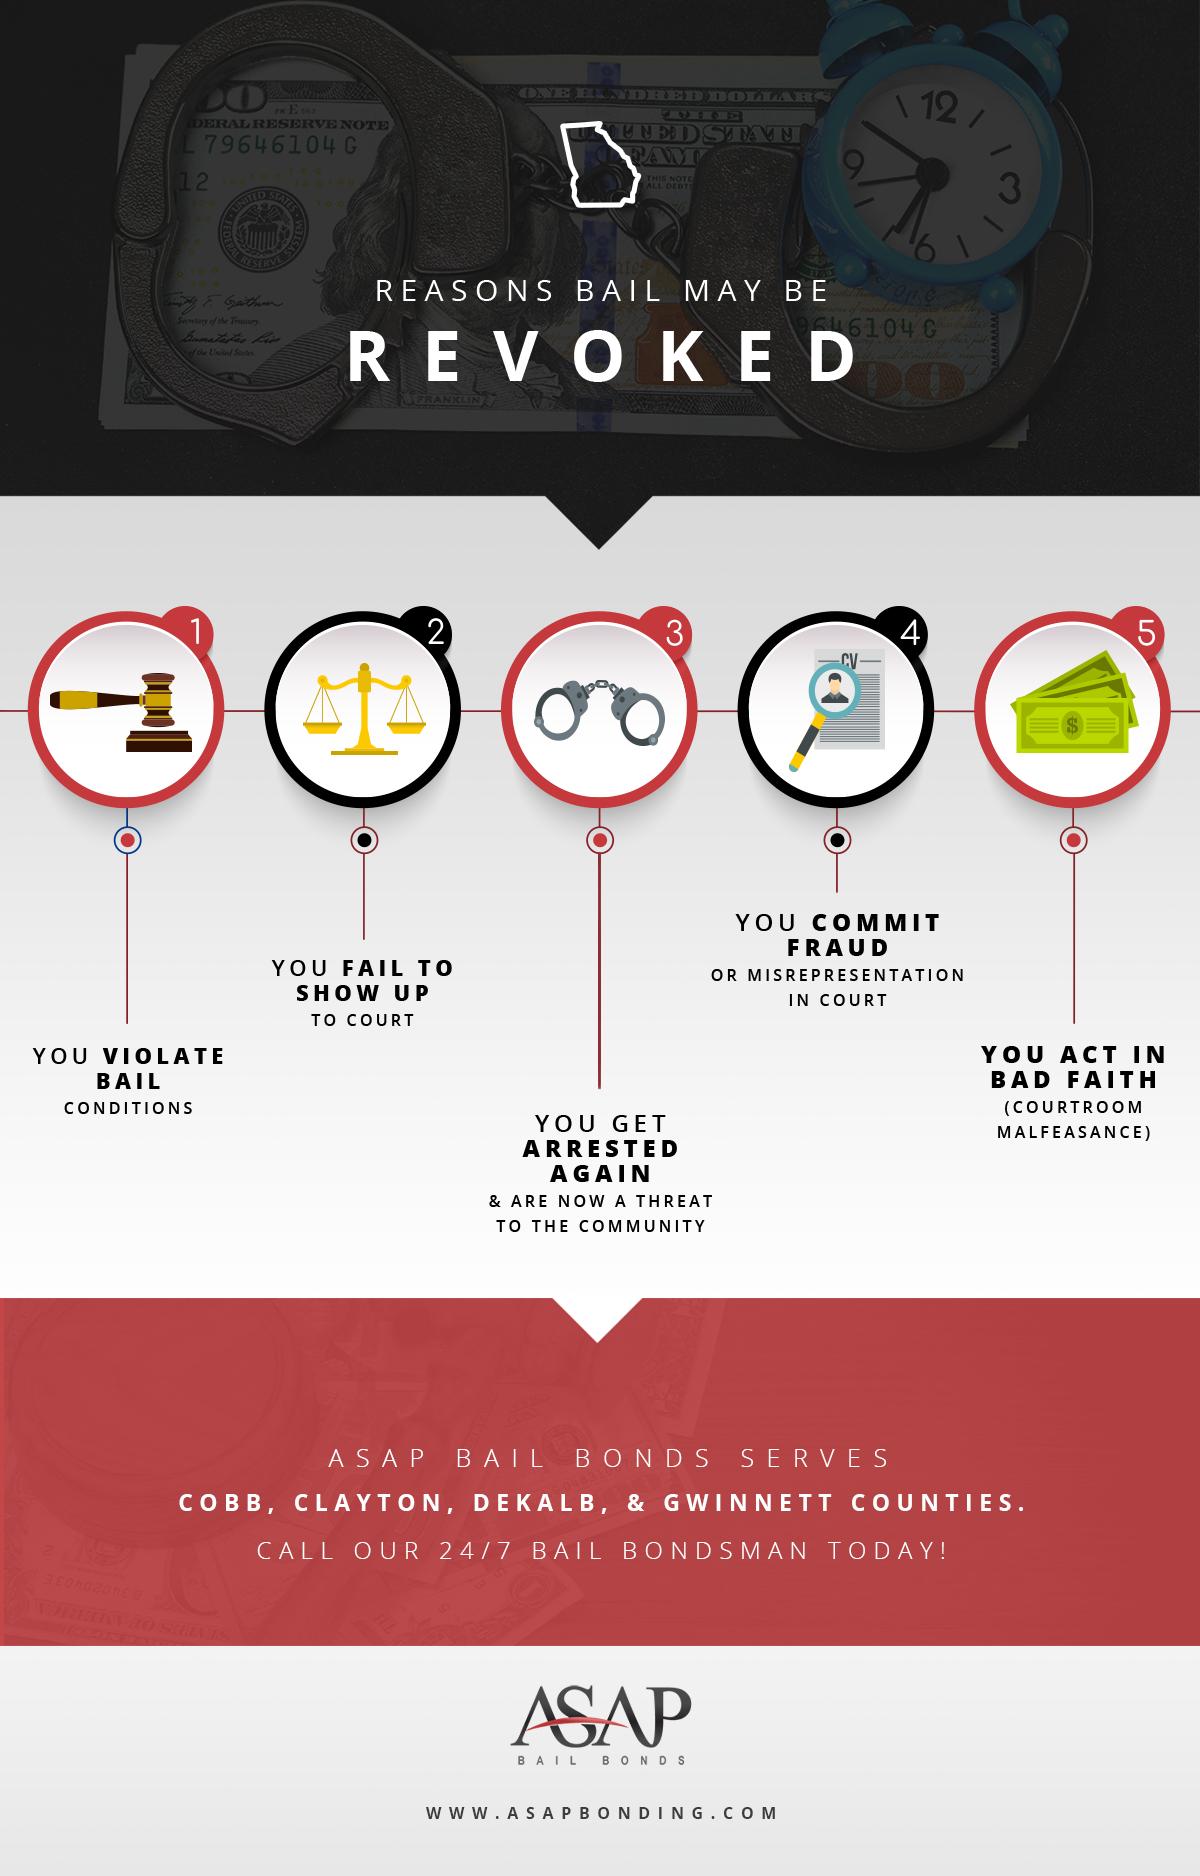 Reasons Bail May Be Revoked